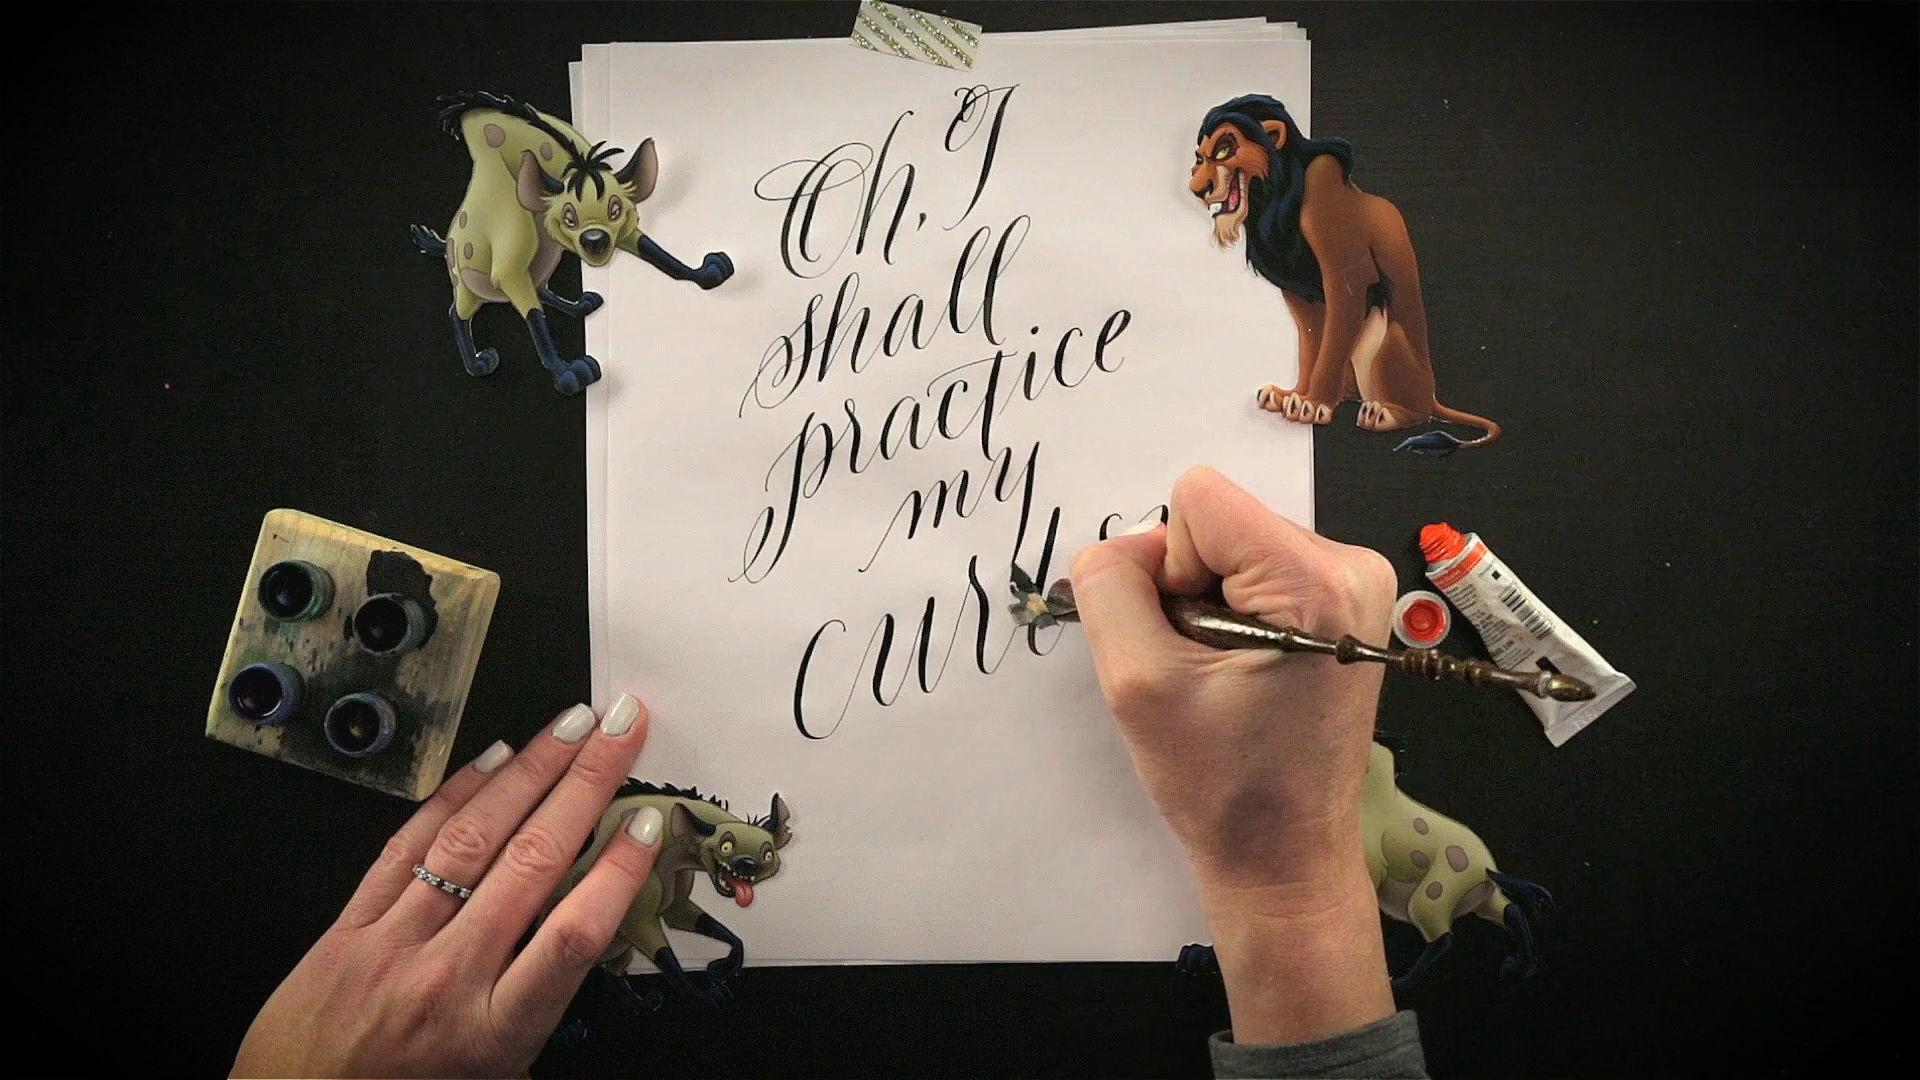 Calligraphy Artist Creates Amazing Disney Villain Quotes Part 1